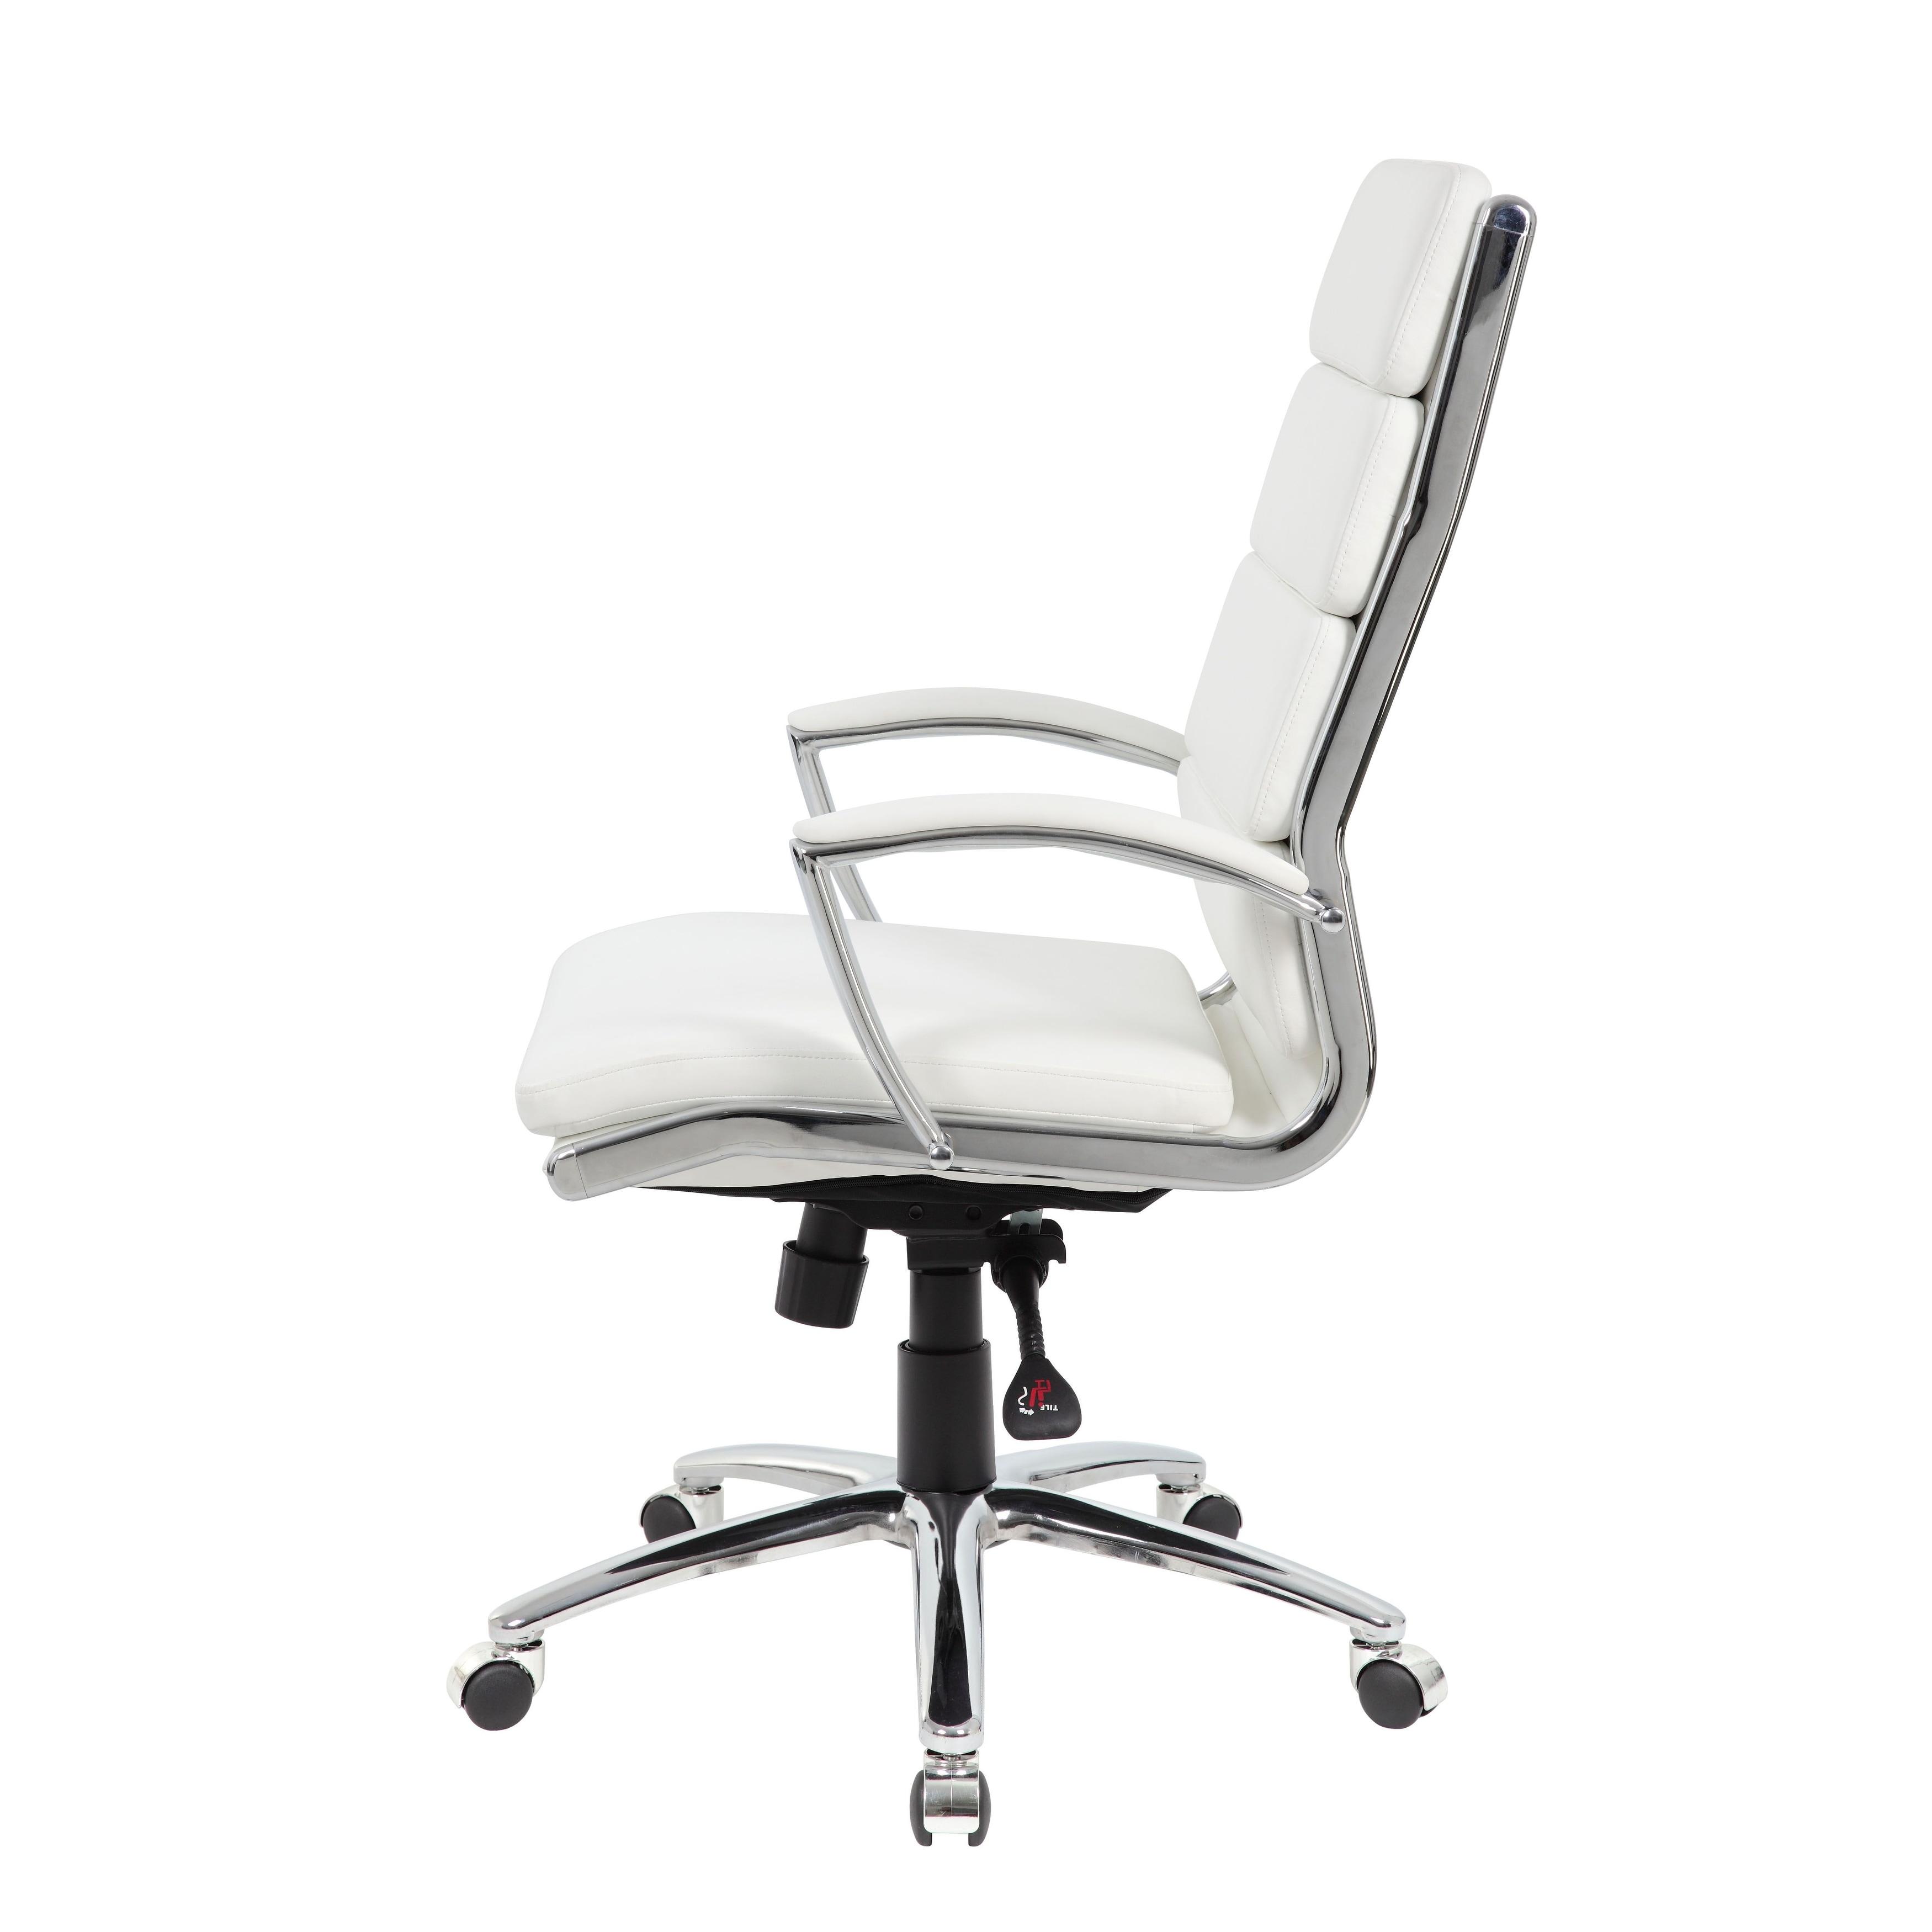 Boss Caressoftplus Chrome Finish Executive Chair Overstock 10099935